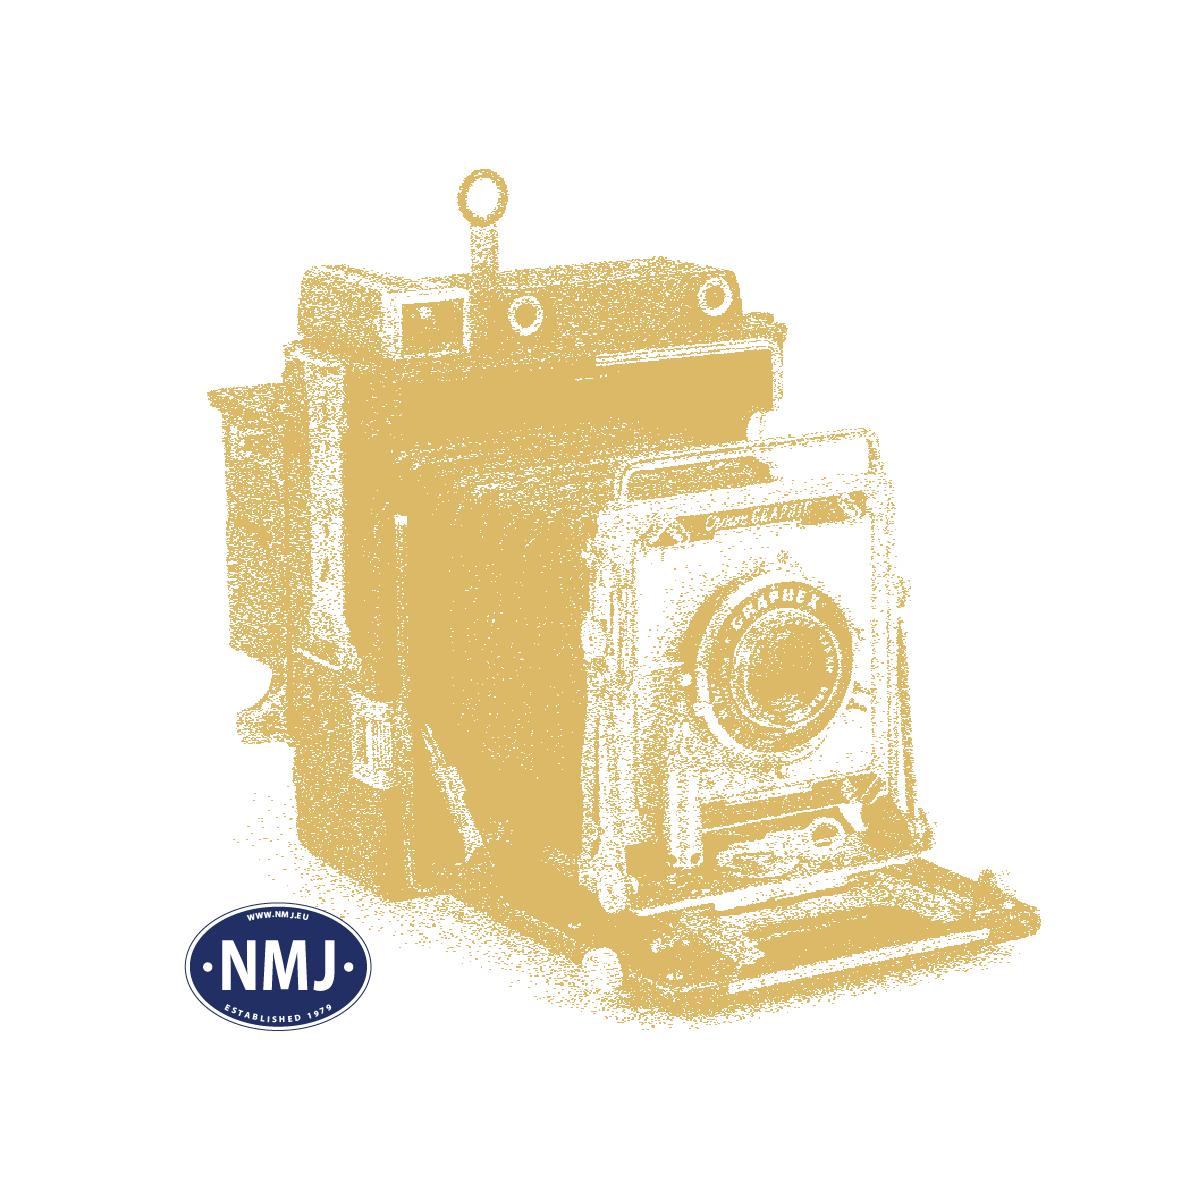 NOC14805 - Tilbehør for veiarbeid